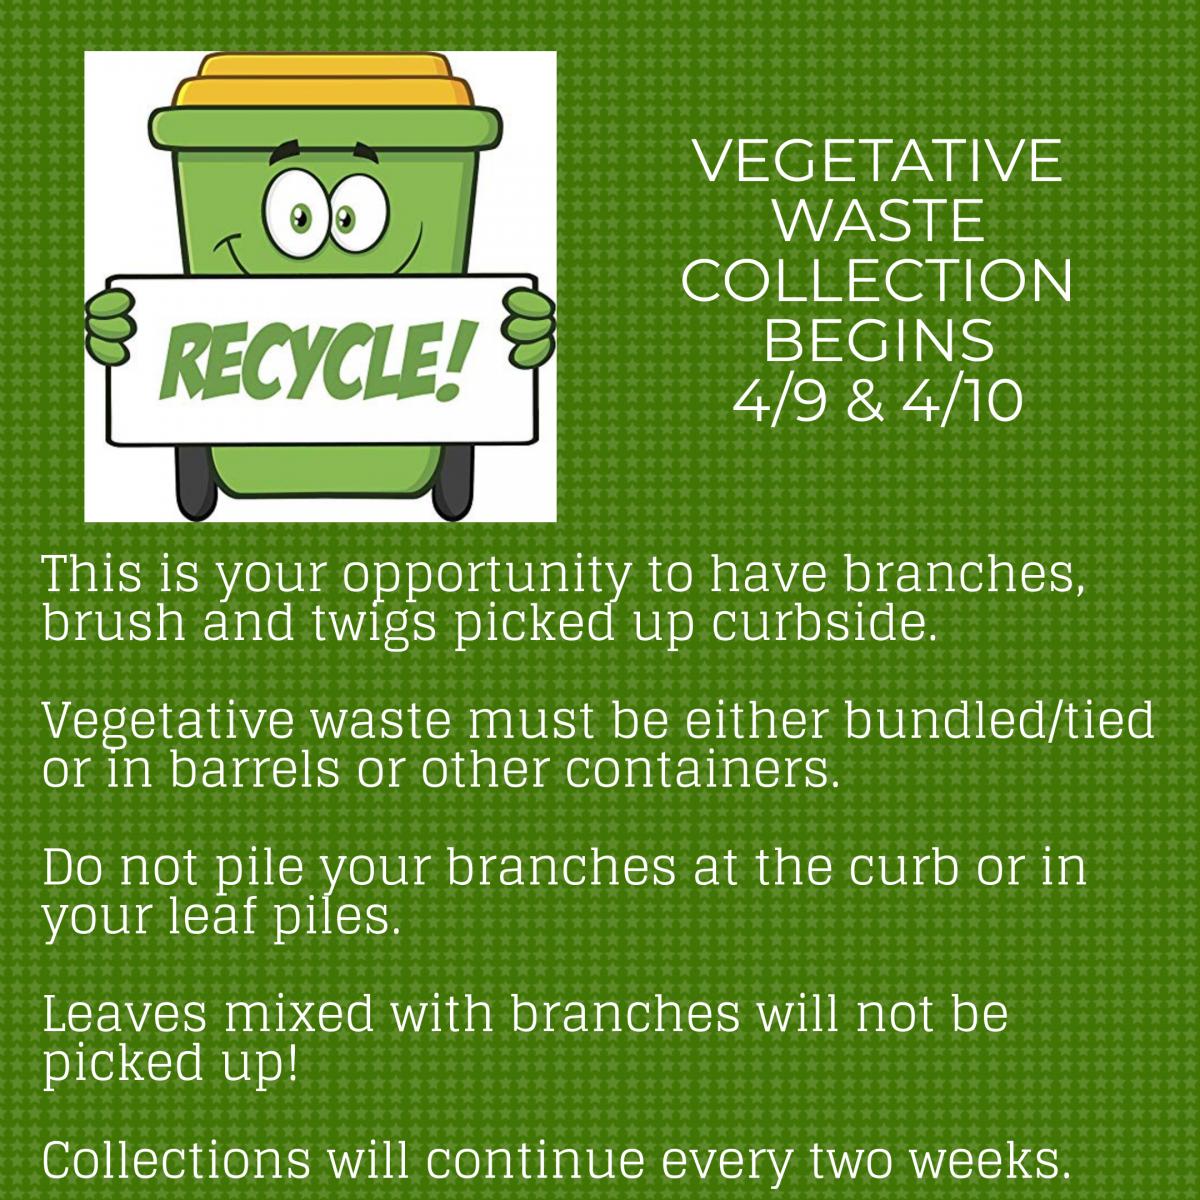 Vegetative Waste begins